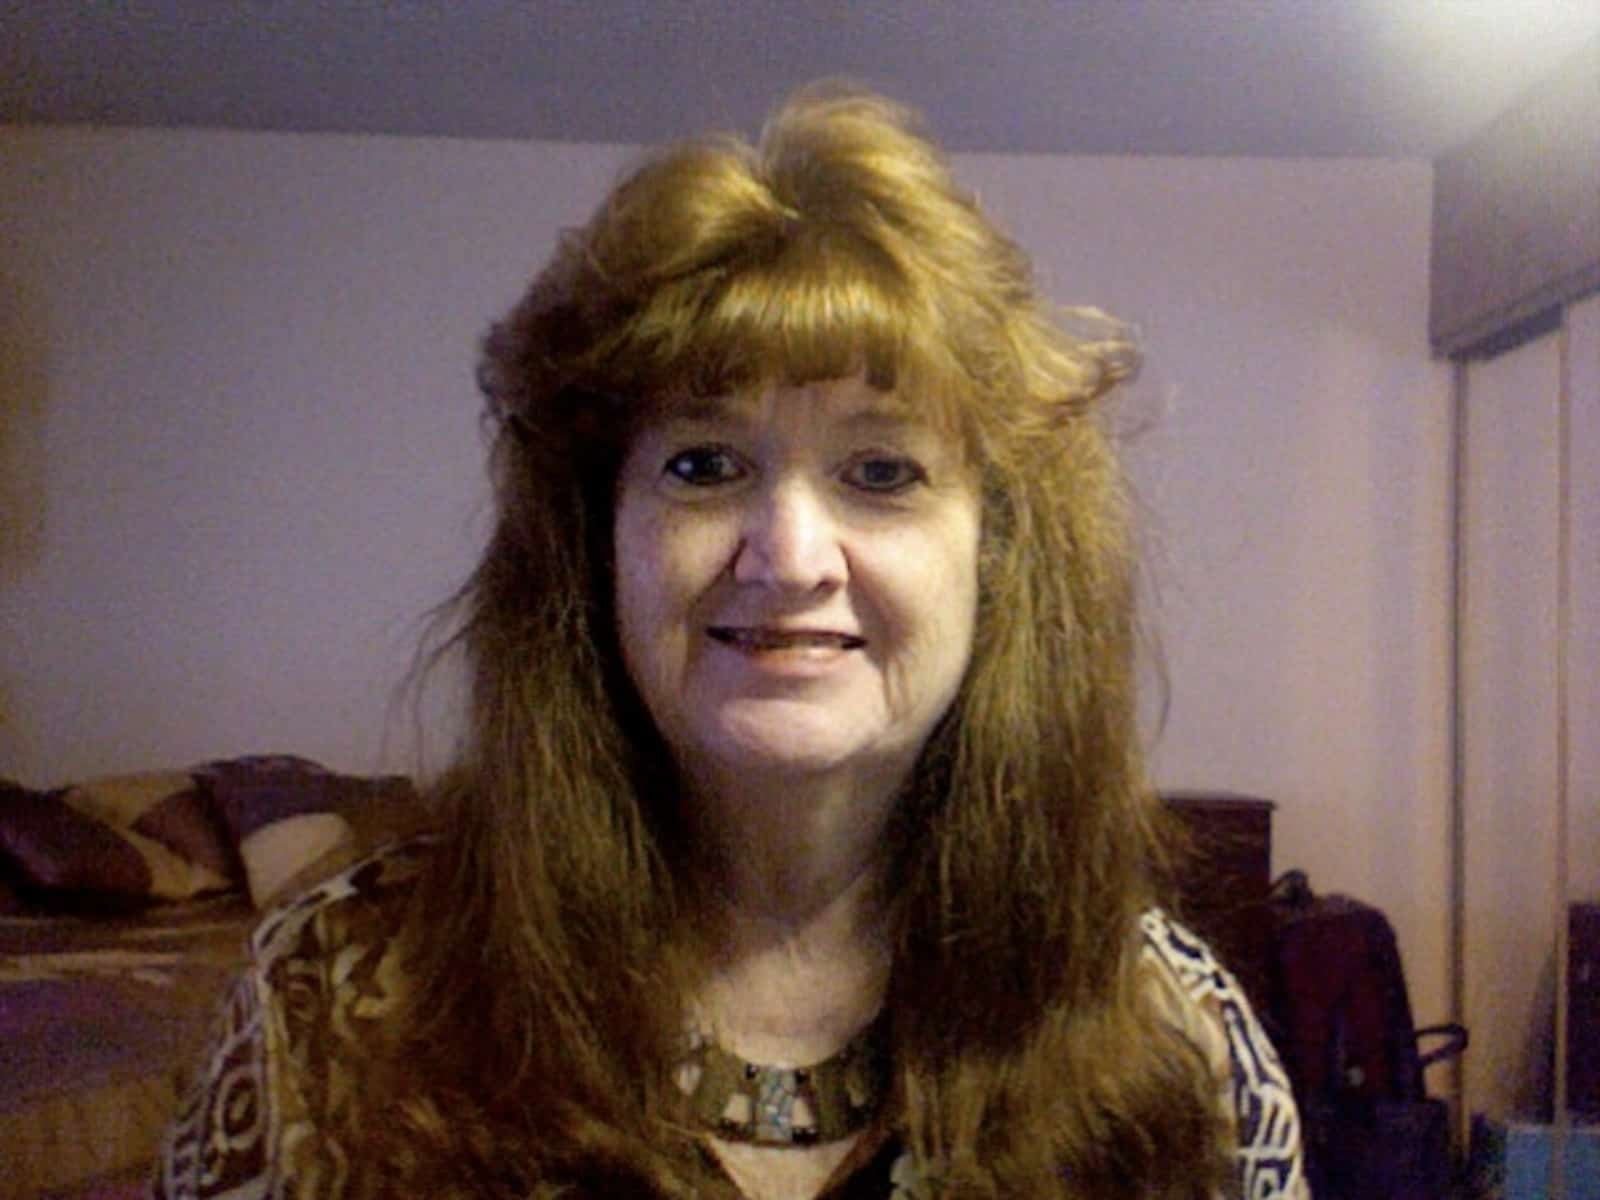 Charlene from Las Vegas, Nevada, United States